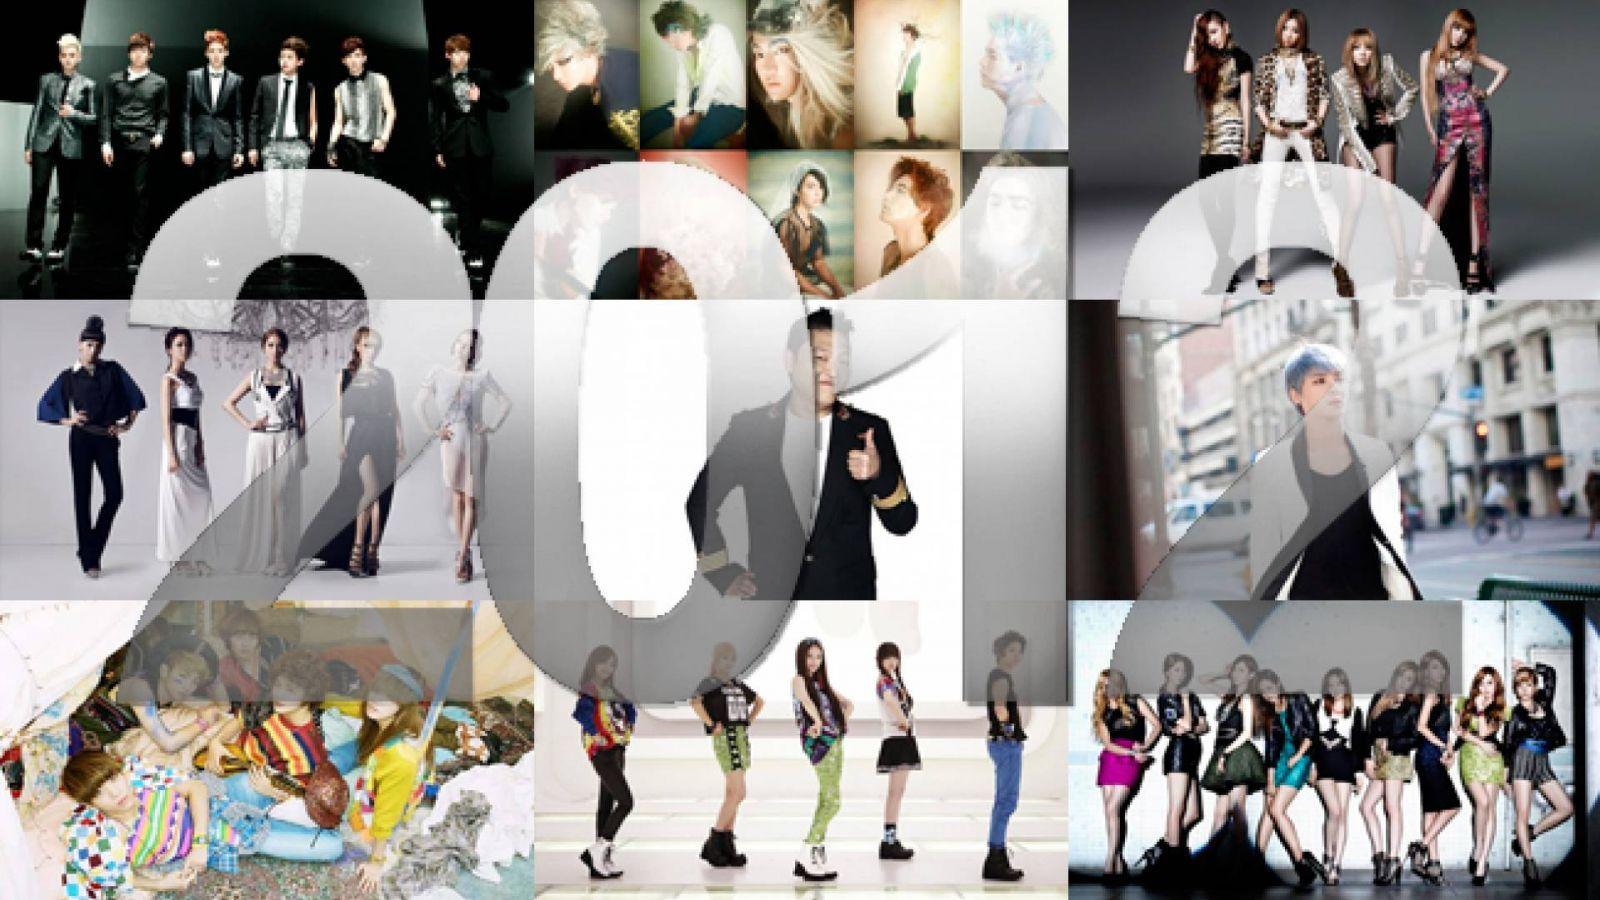 Bestsellers do YesAsia em 2012 © Respective artists